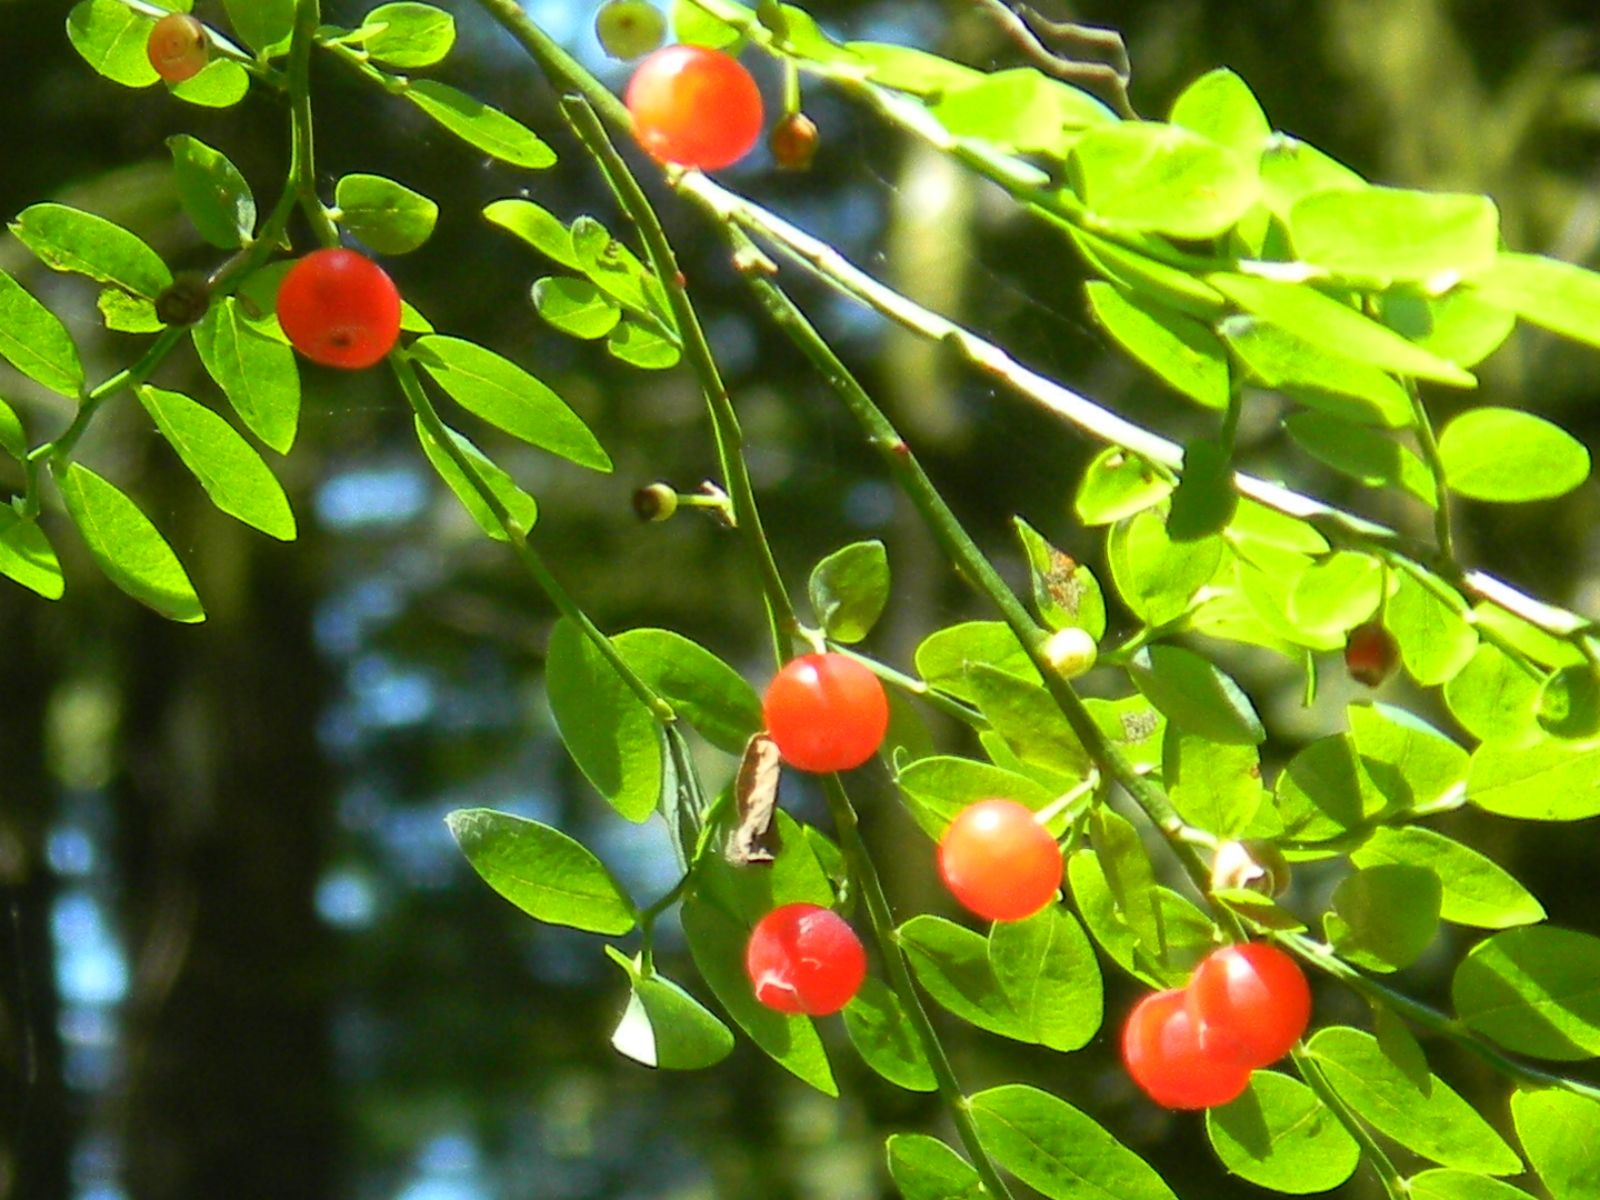 Native Plants To Oregon Part - 46: Red Huckleberries - Mt. Hood, Oregon. Native PlantsHuckleberryRecipiesOregon BerriesHoodsMedicineChildhoodCowls